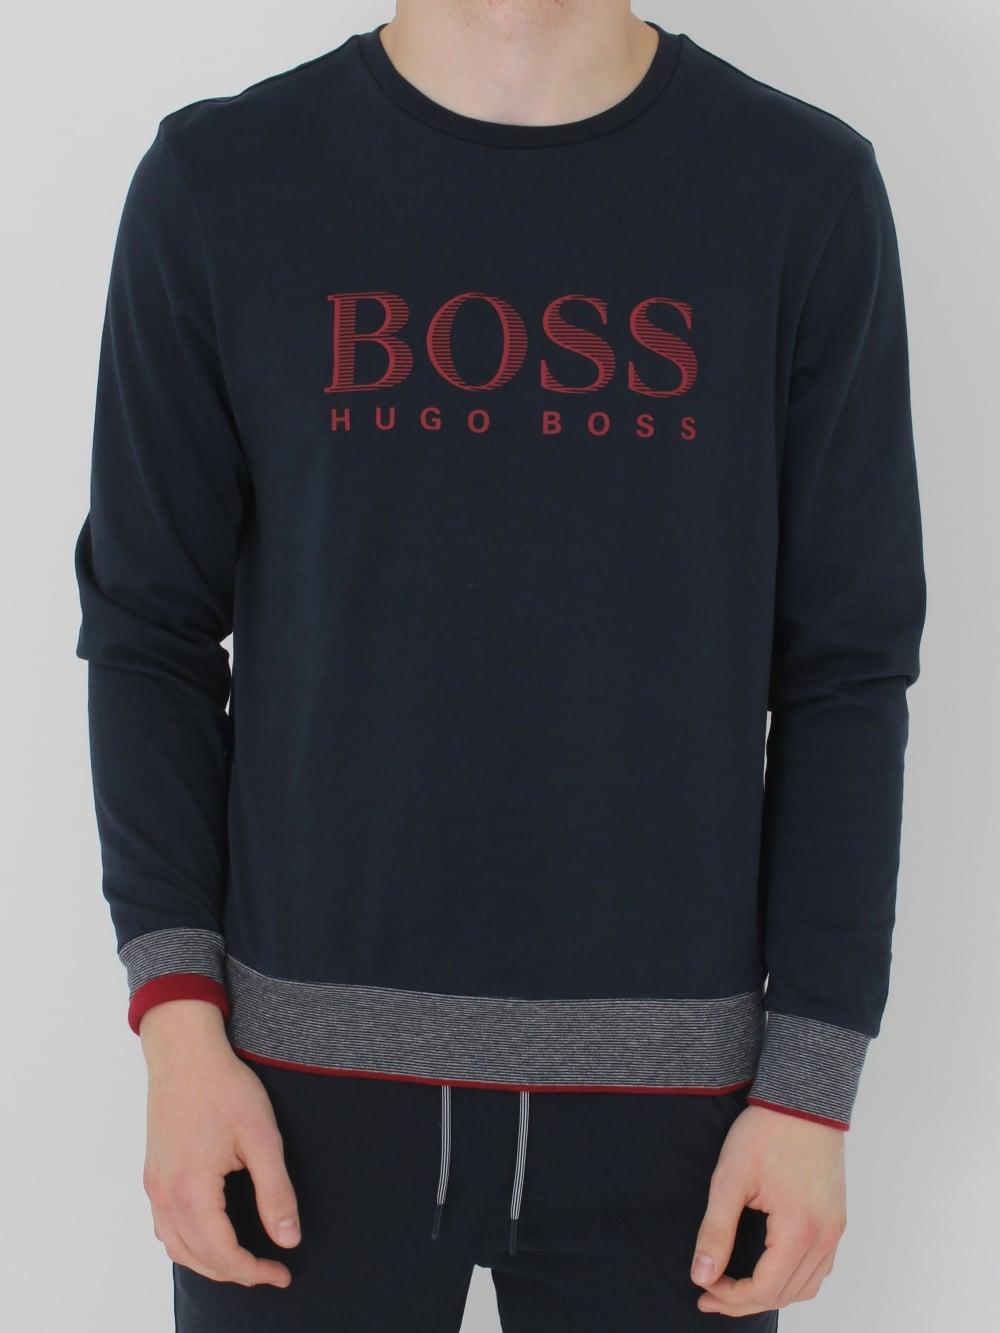 8dc75e0c2 HUGO BOSS - Boss Hugo Boss Cew Neck Sweatshirt in Dark Blue ...